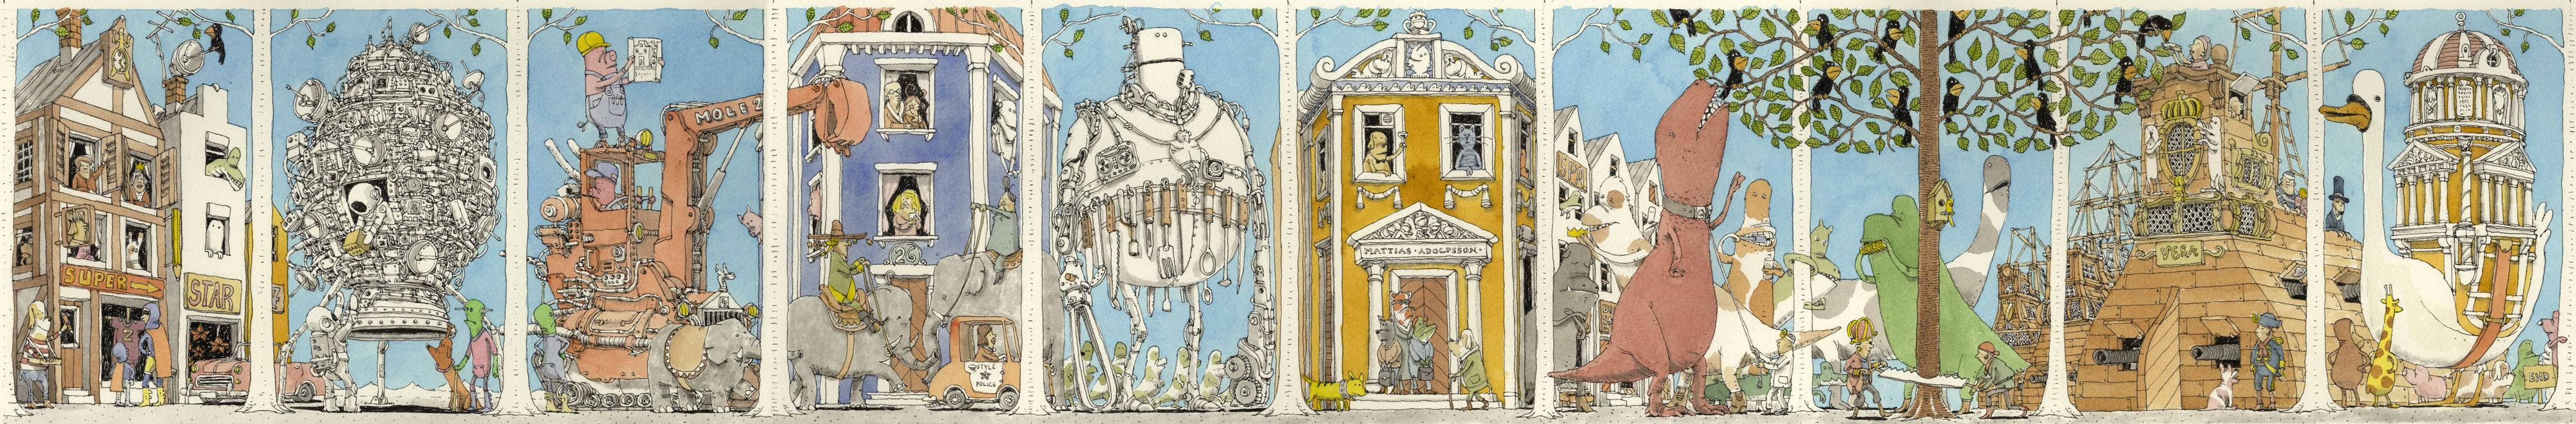 Postcard book by MattiasA